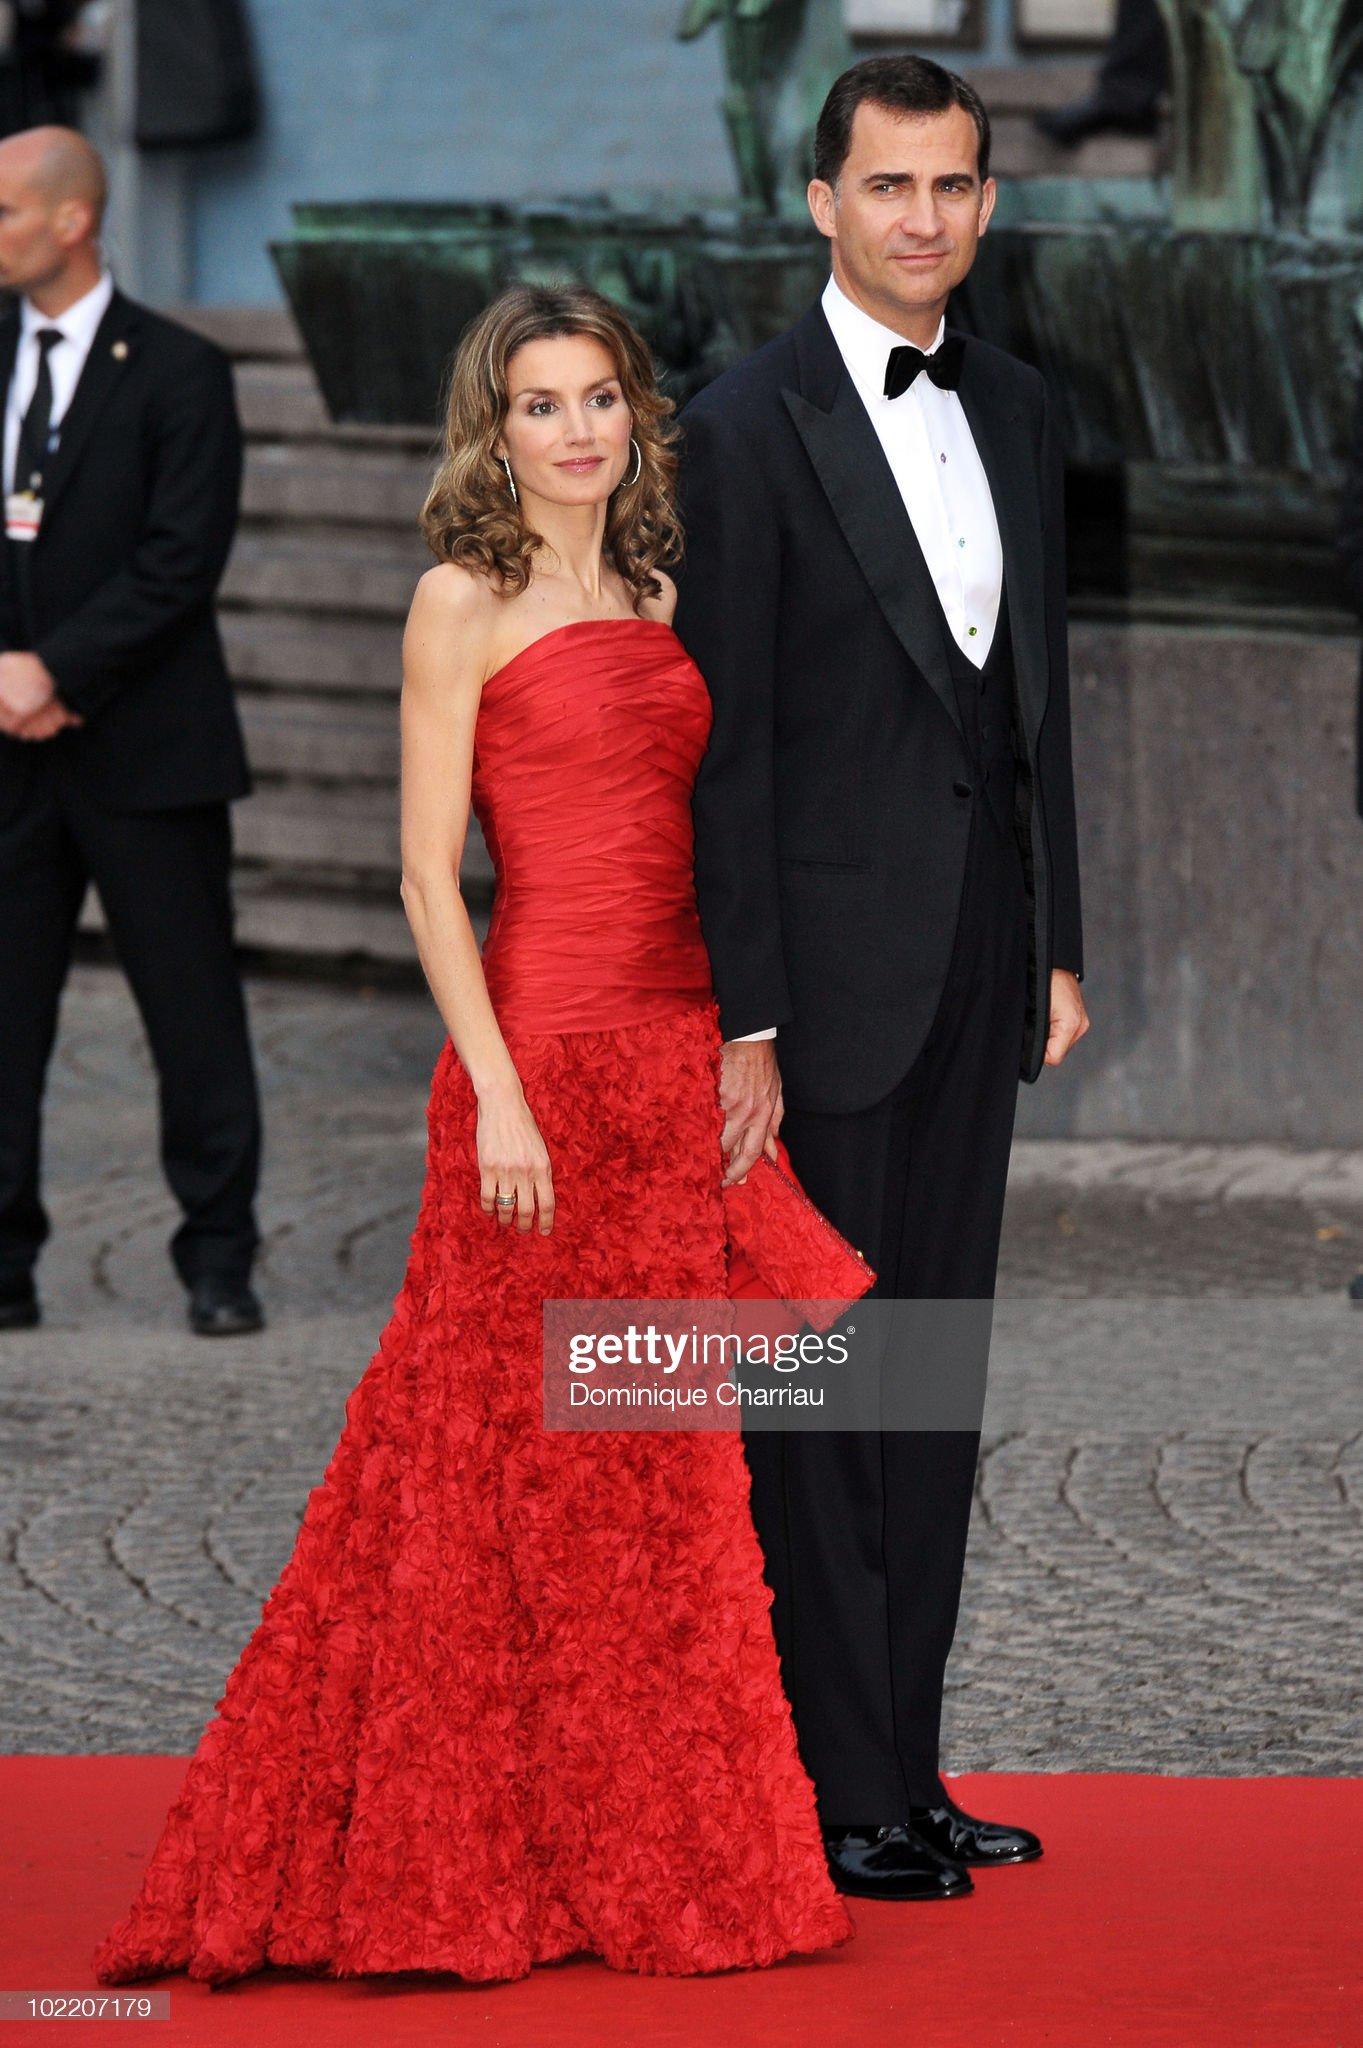 Вечерние наряды Королевы Летиции Crown Princess Victoria And Daniel Westling Wedding - Gala Performance - Arrivals : News Photo